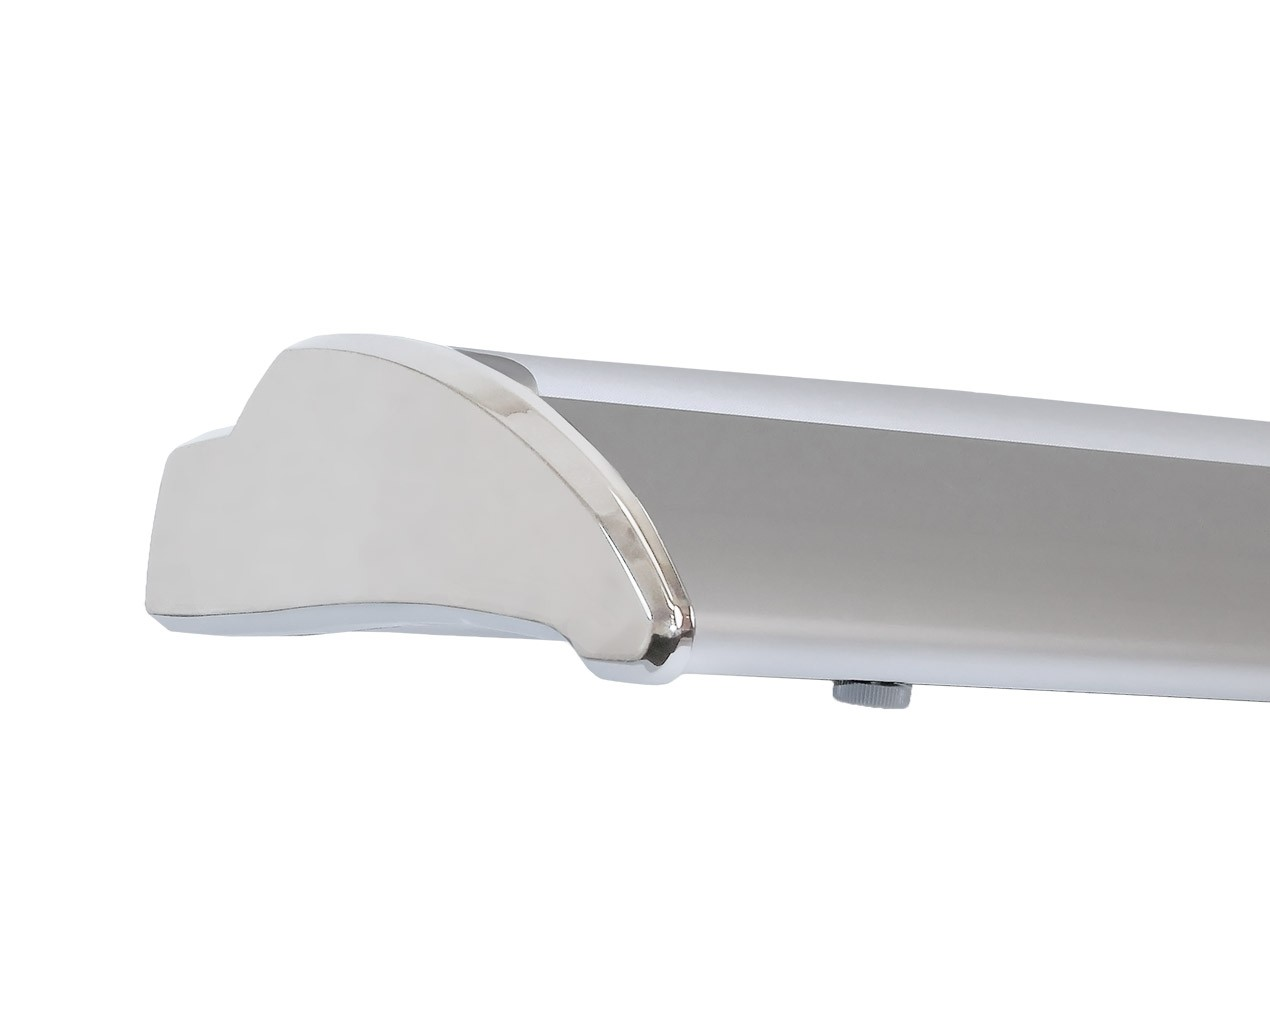 QuickSilver Pro 60 retractable banner stand